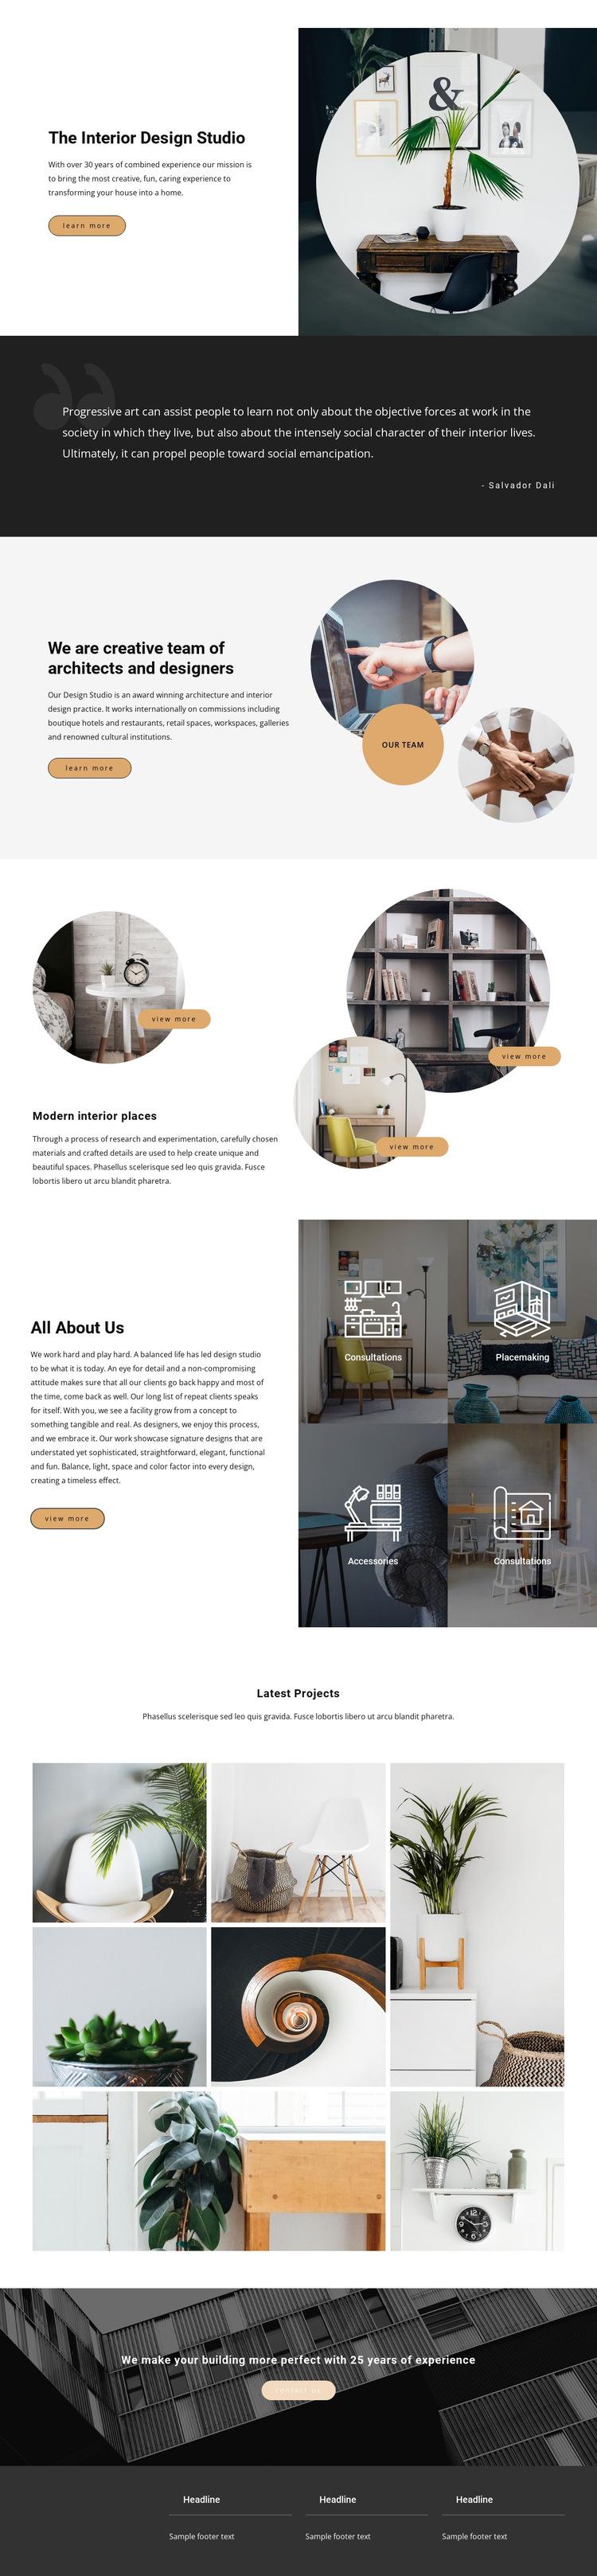 Interior Design Studio HTML5 Template